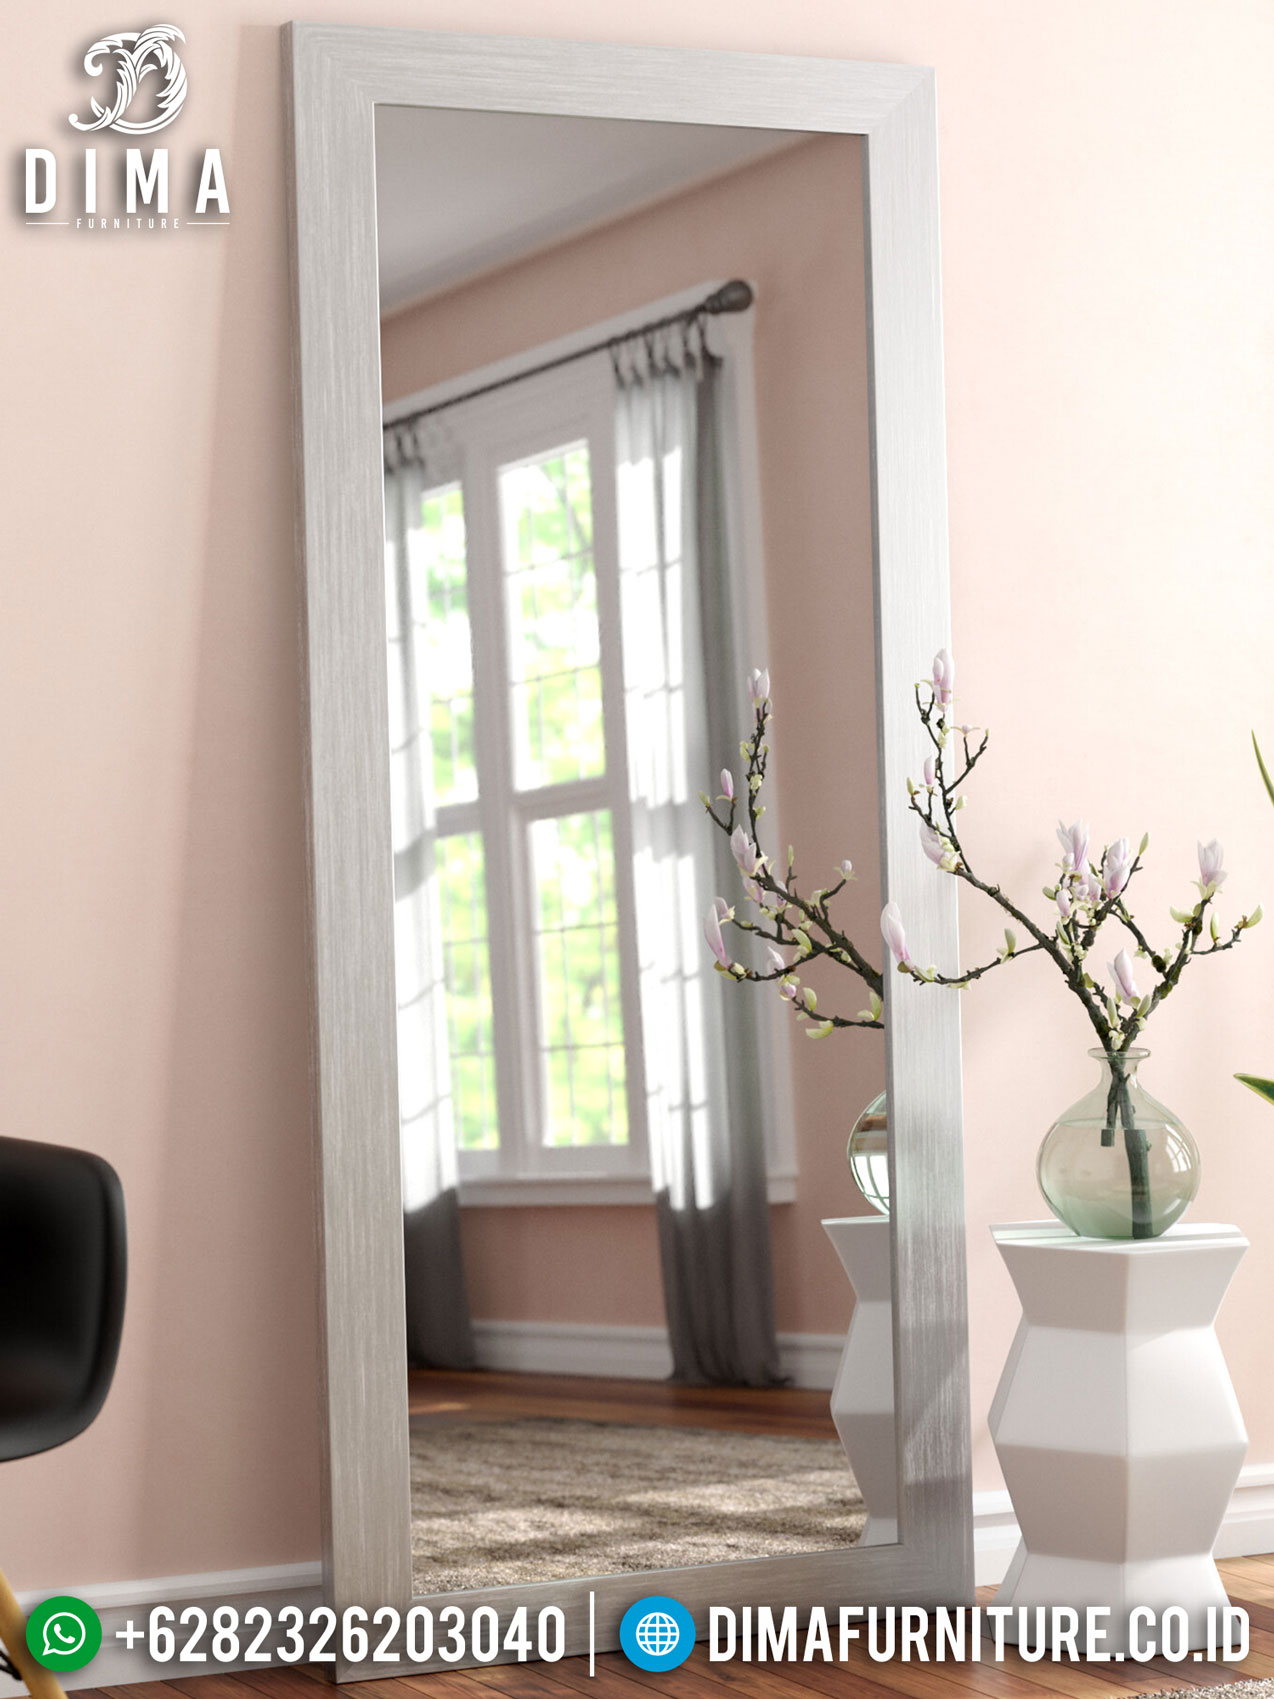 Jual Cermin Rias Minimalis Stand Style Best Quality Mebel Jepara Update TTJ-1295